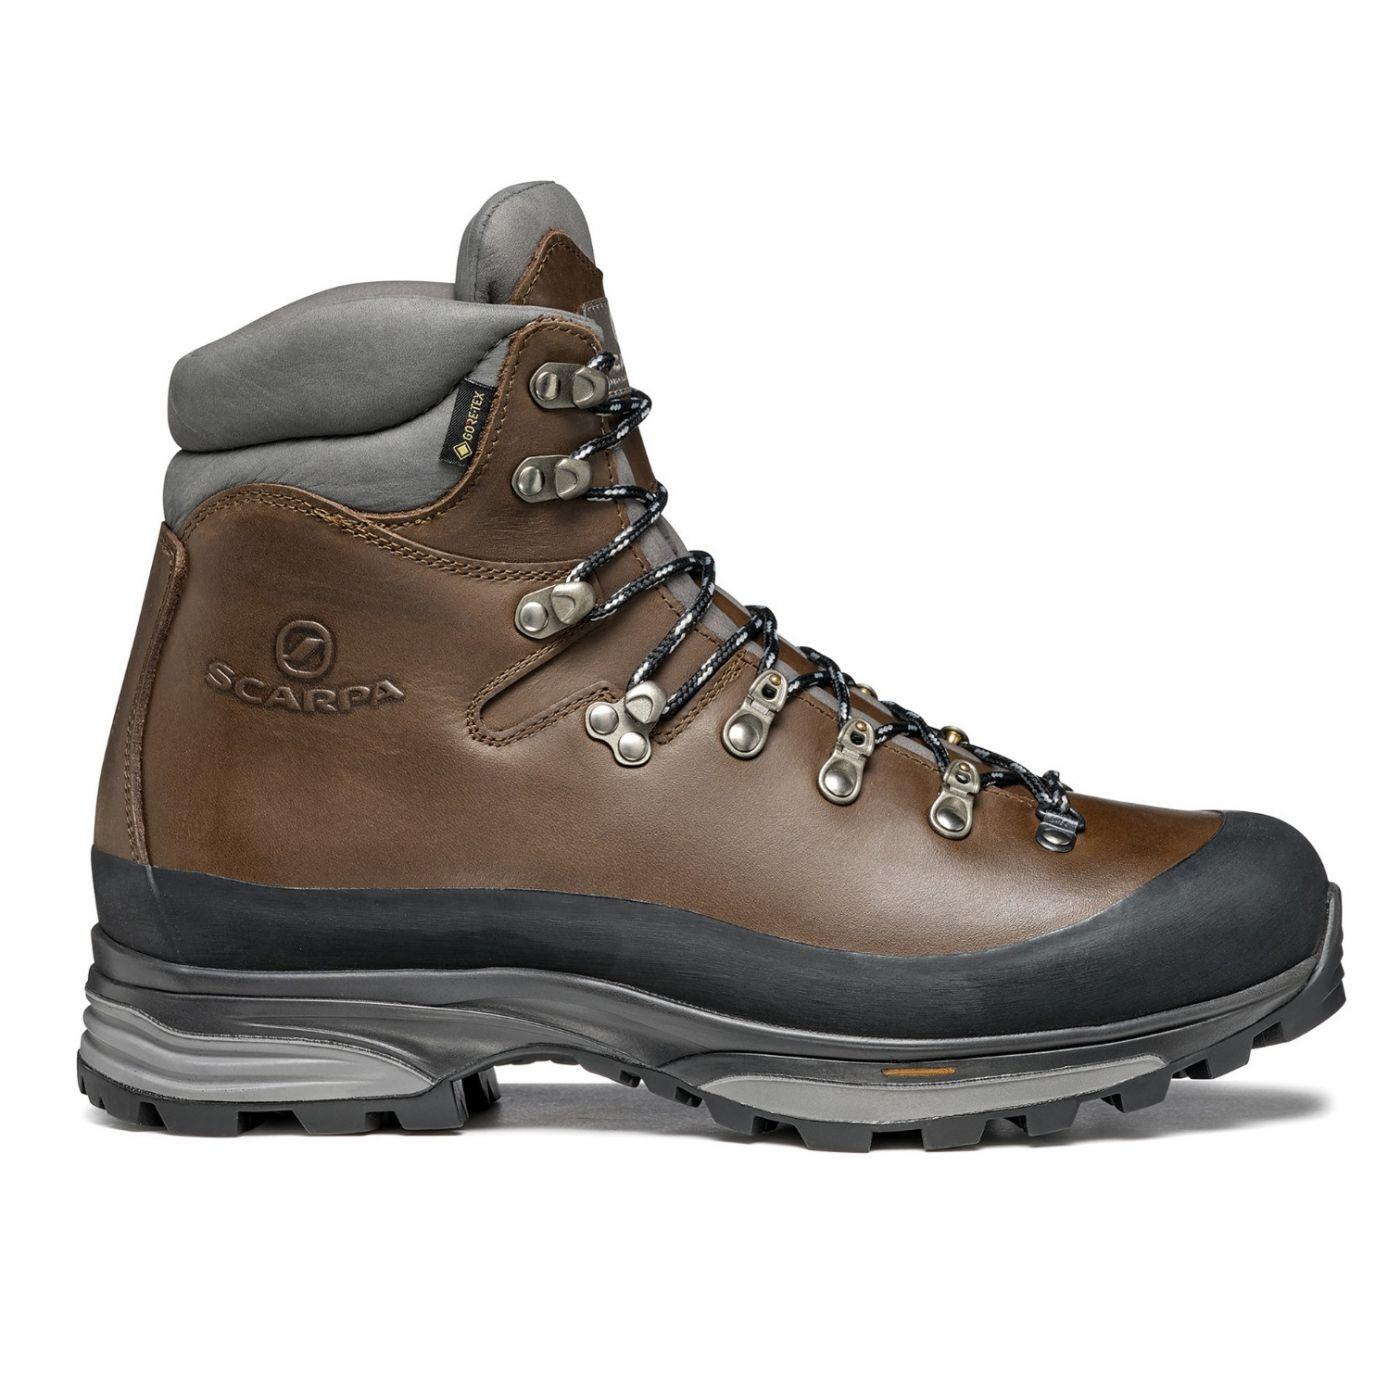 Kinesis Pro GTX Boot - Men's